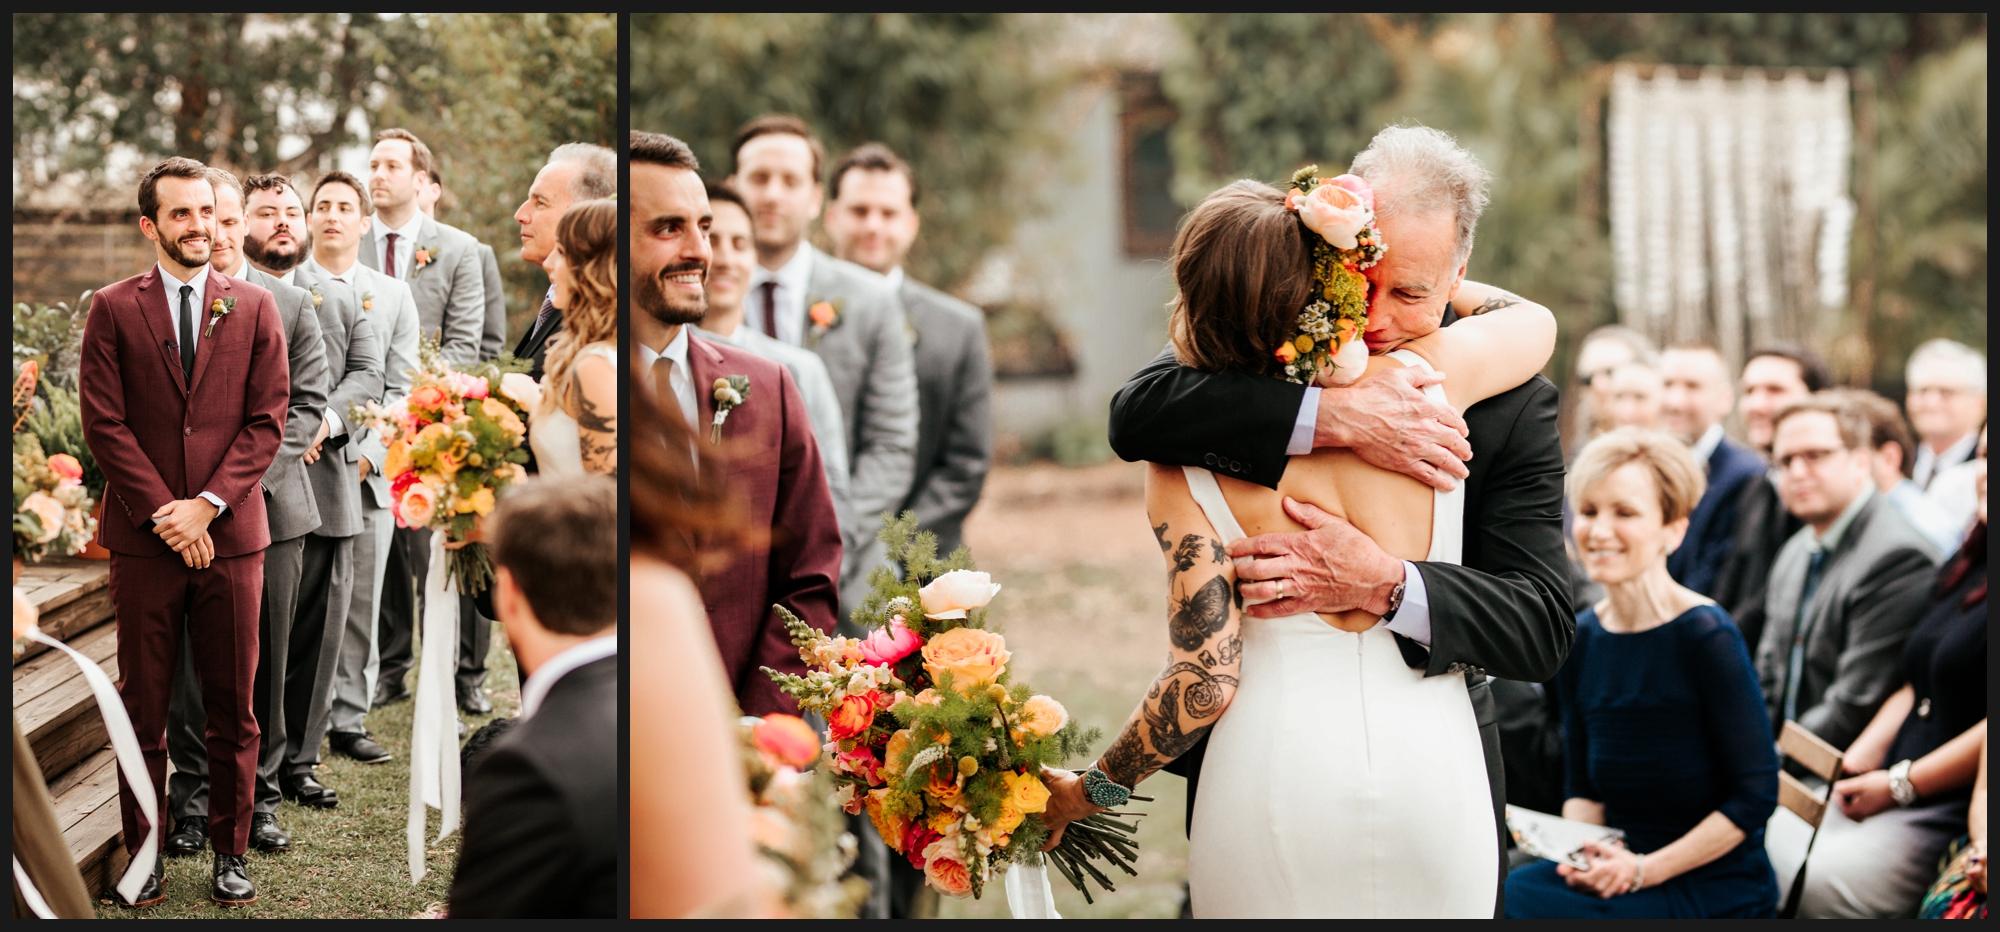 Orlando-Wedding-Photographer-destination-wedding-photographer-florida-wedding-photographer-bohemian-wedding-photographer_1948.jpg